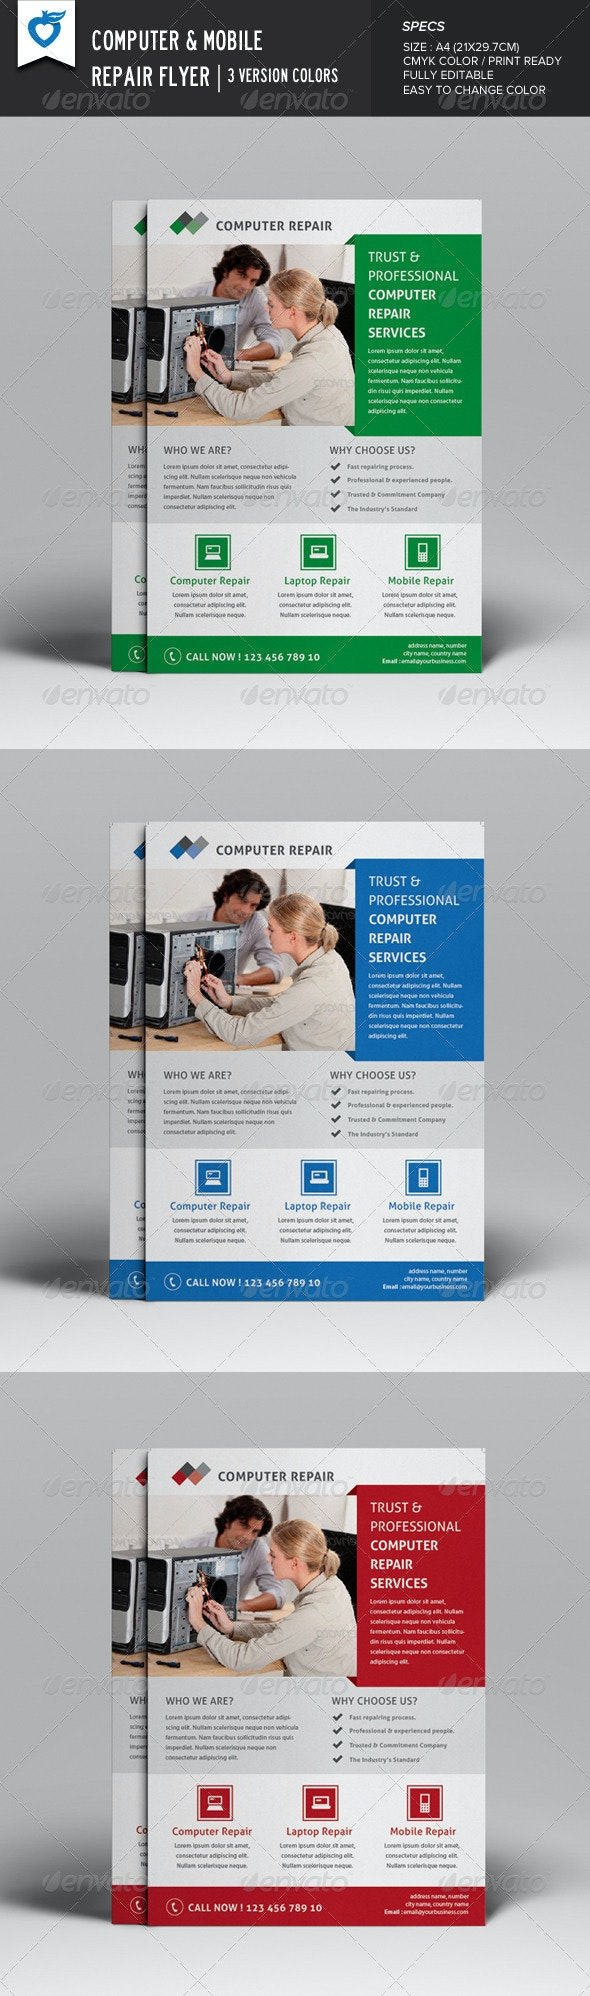 Computer & Mobile Repair Flyer - Corporate Flyers